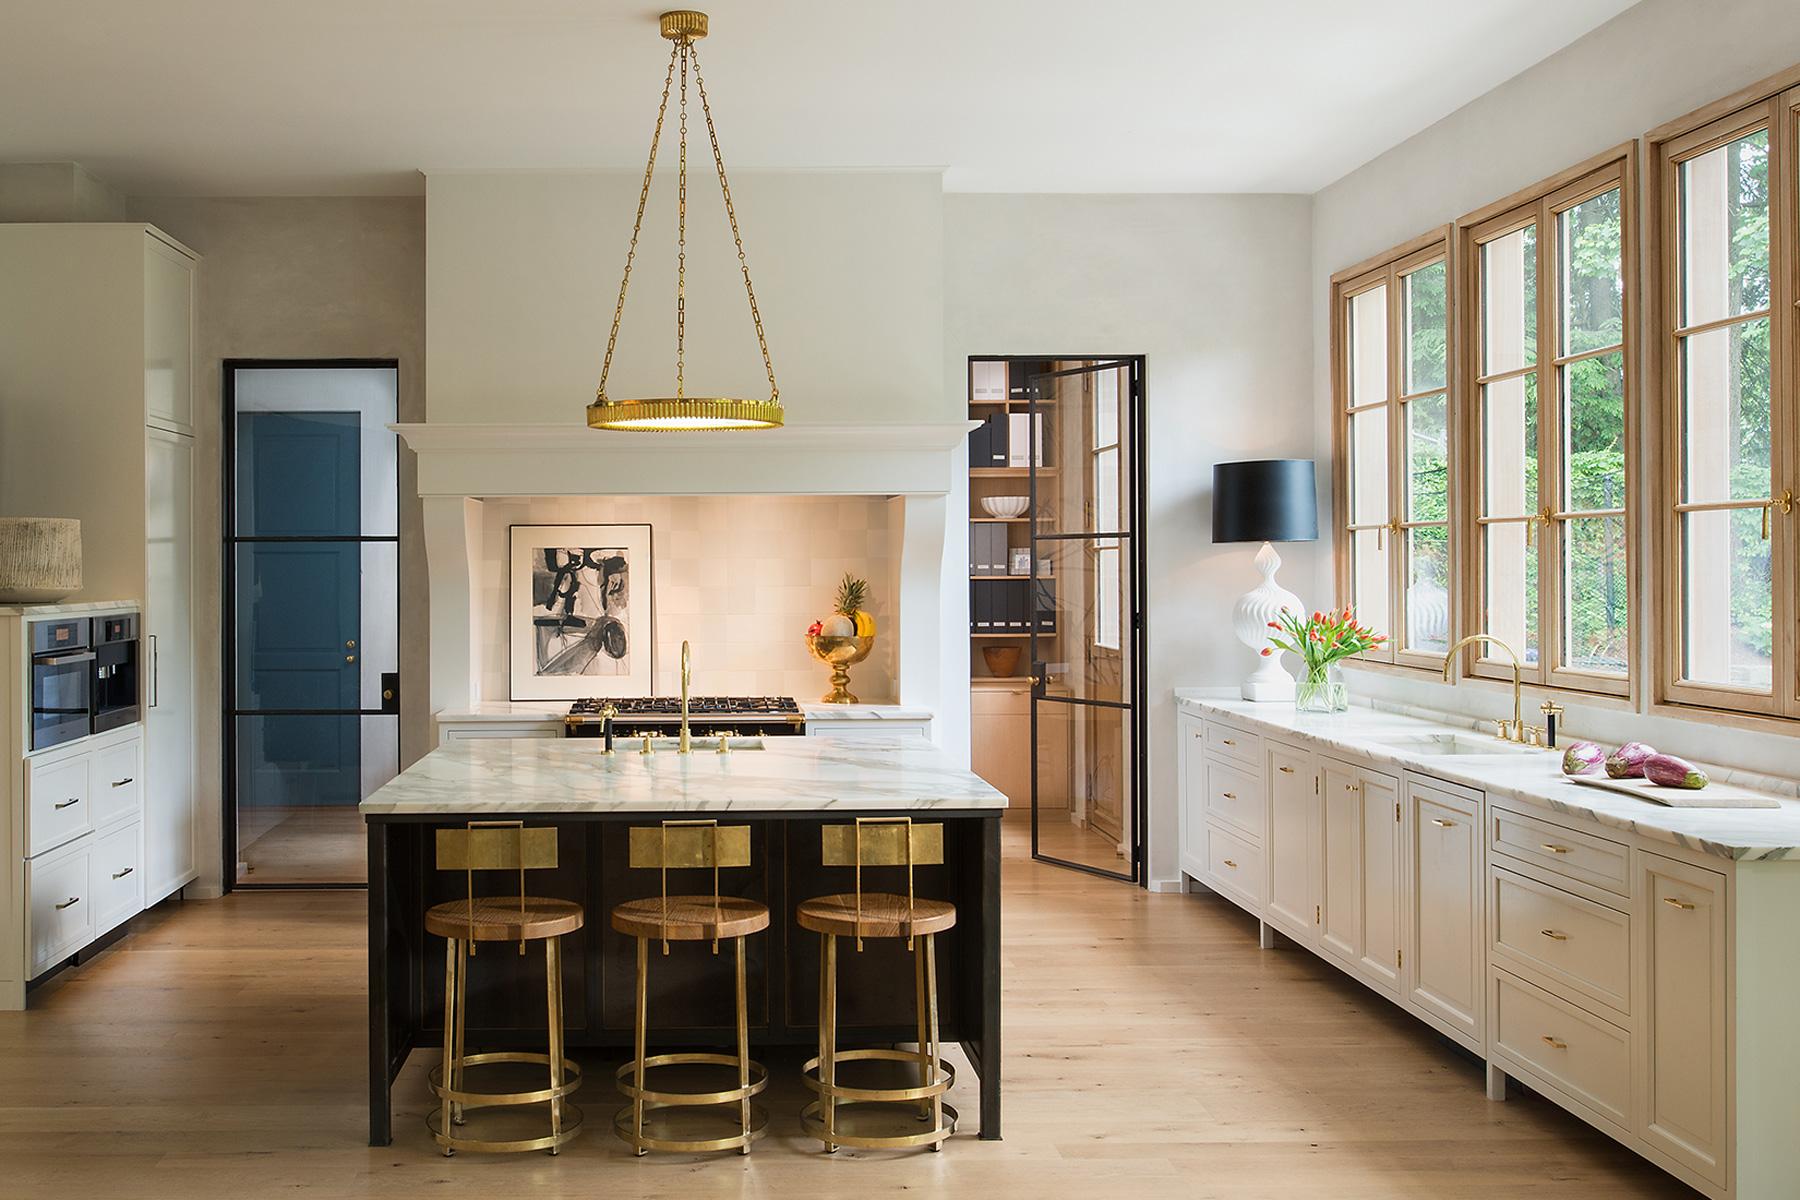 Contemporary kitchen by Barnes Vanze Architects, Inc.